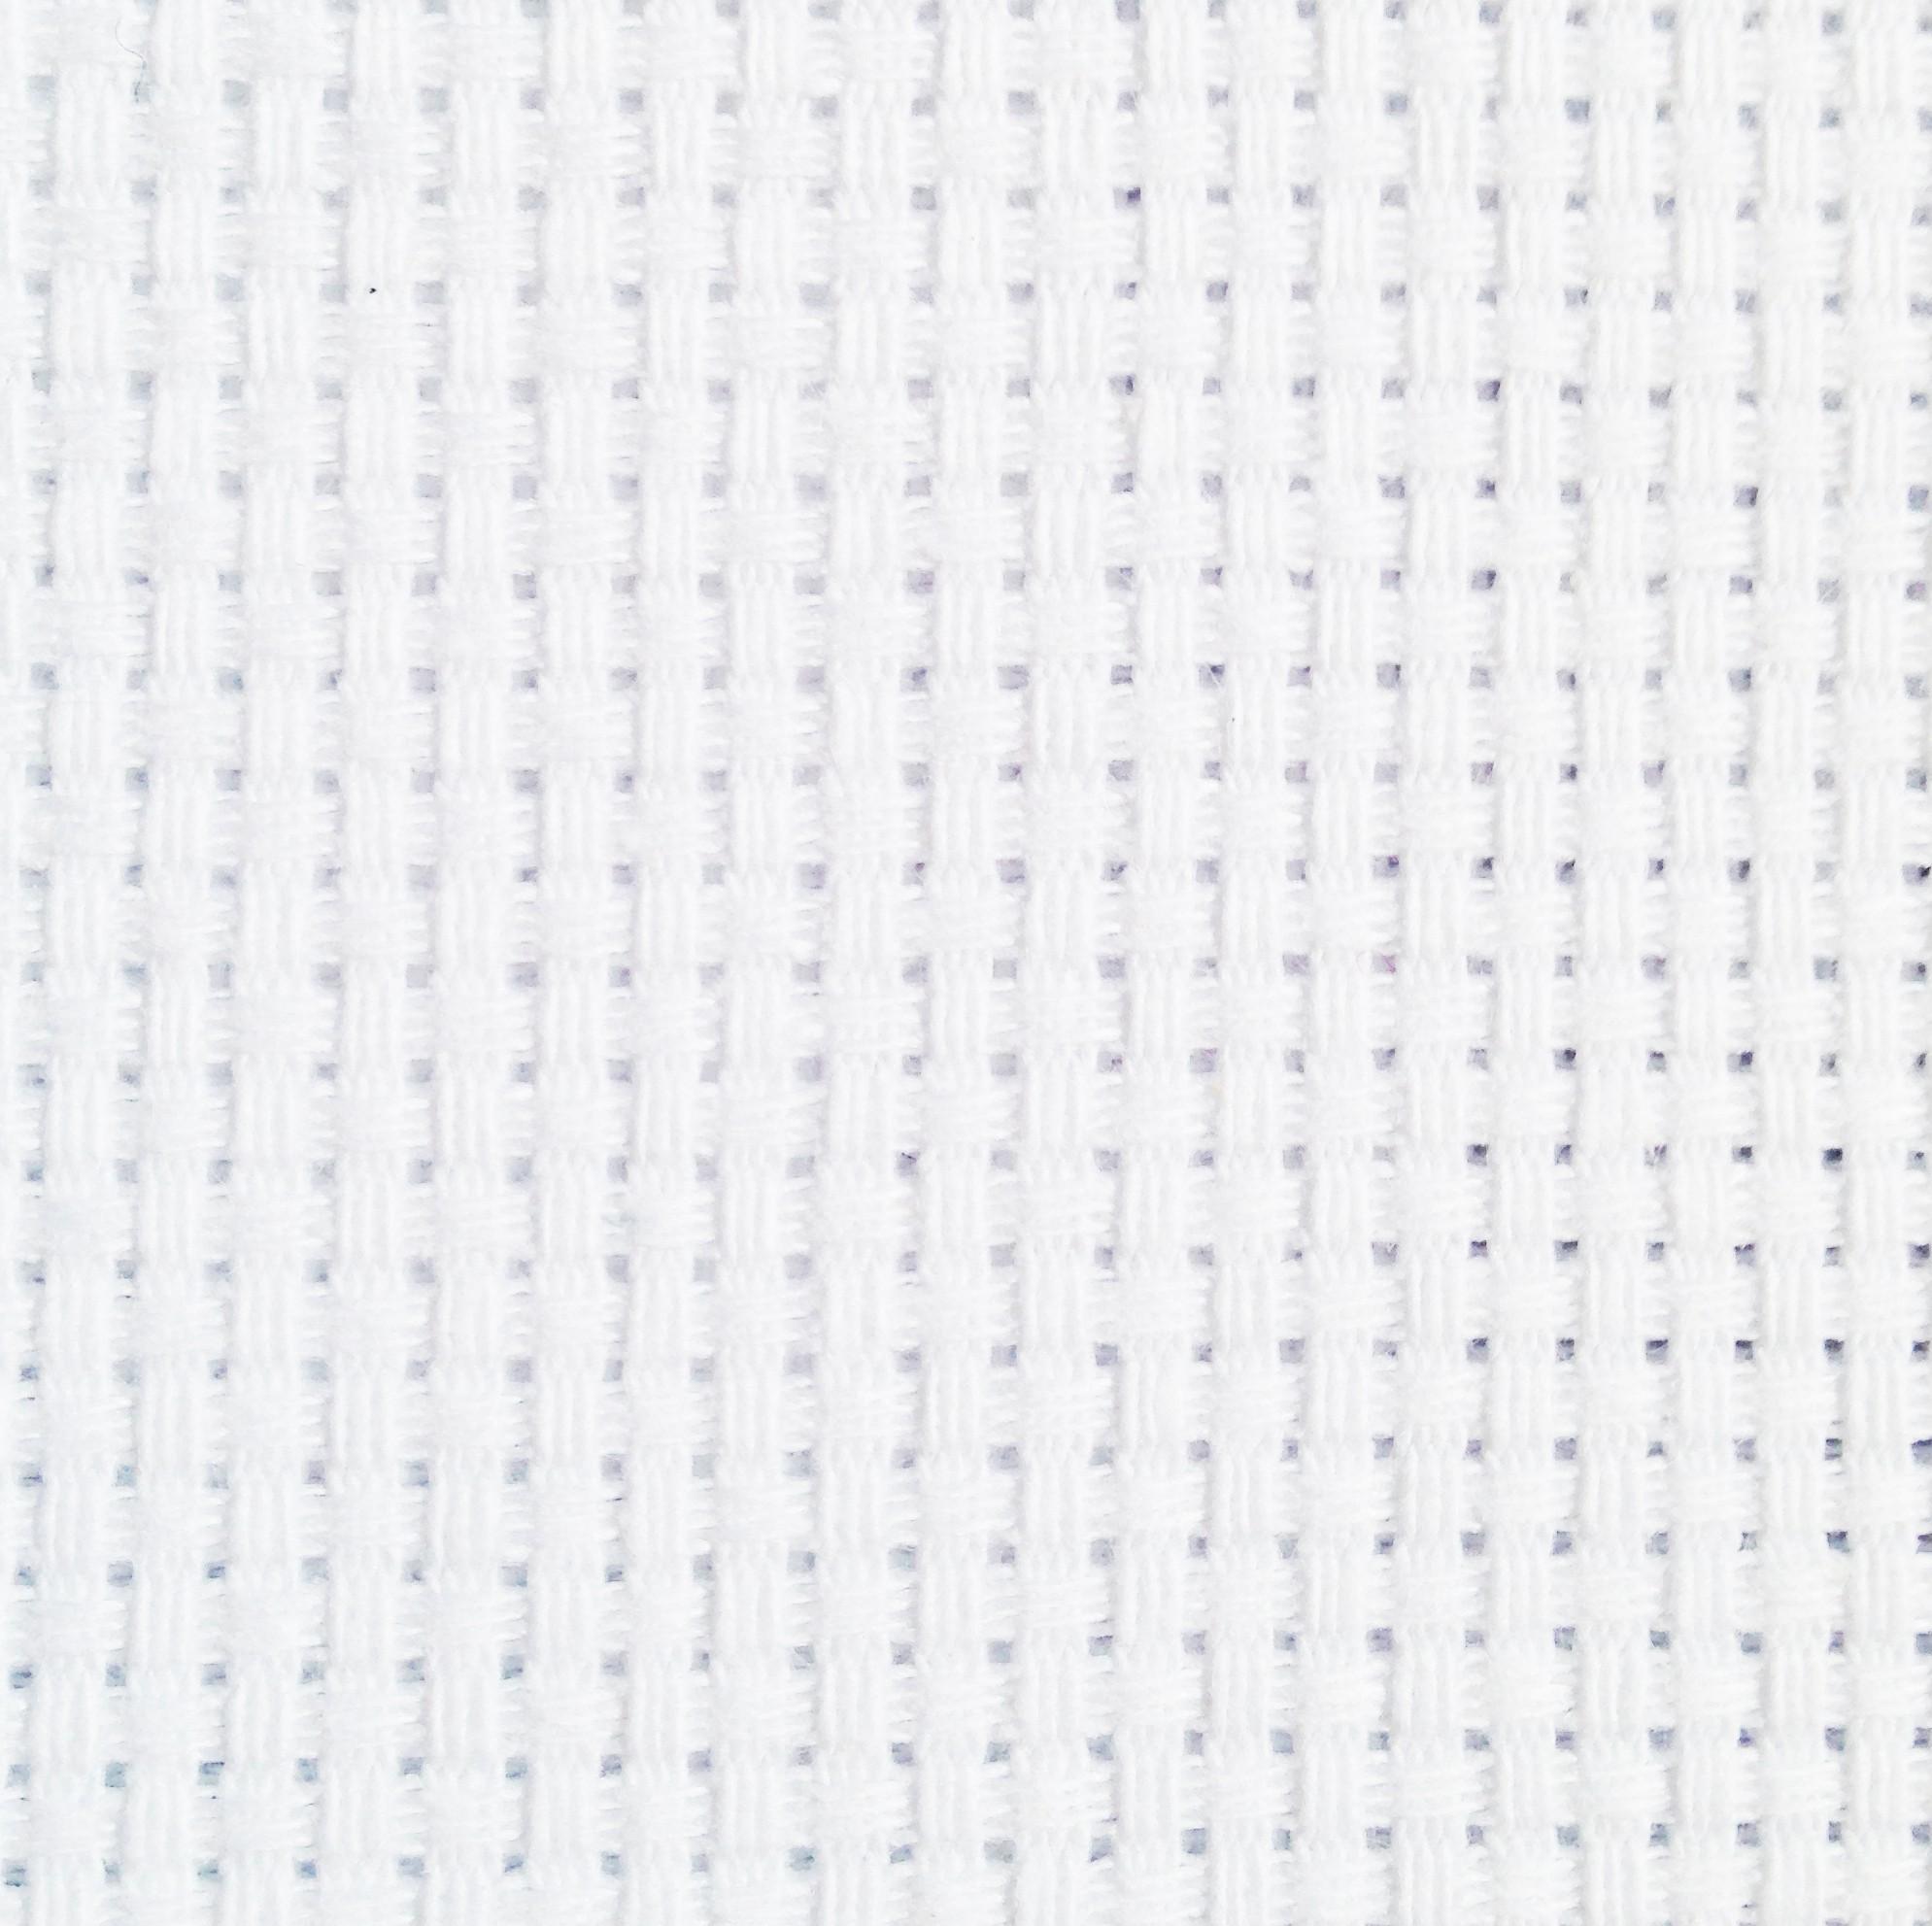 White Aida Cloth 14ct - Quality Zweigart Brand 2 sizes